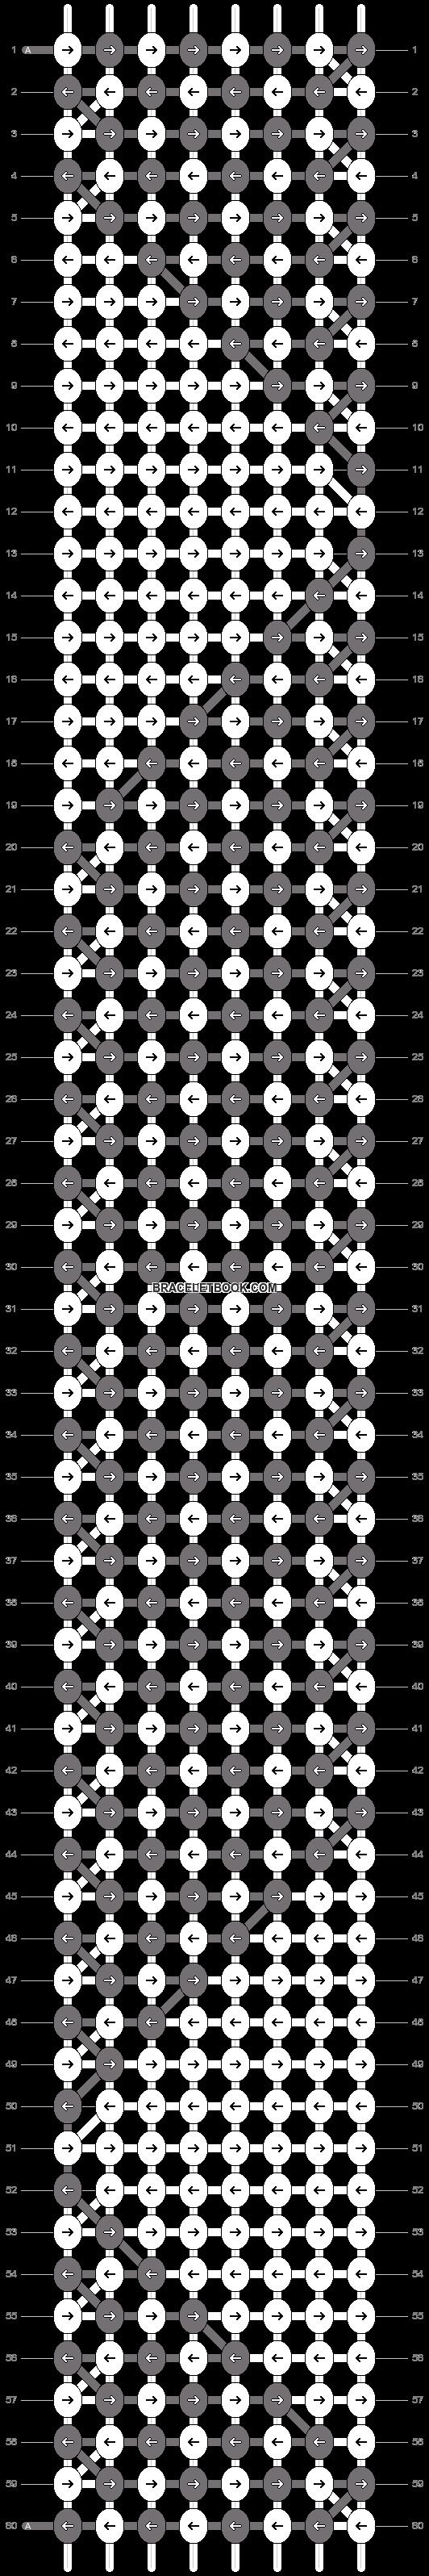 Alpha pattern #22017 pattern